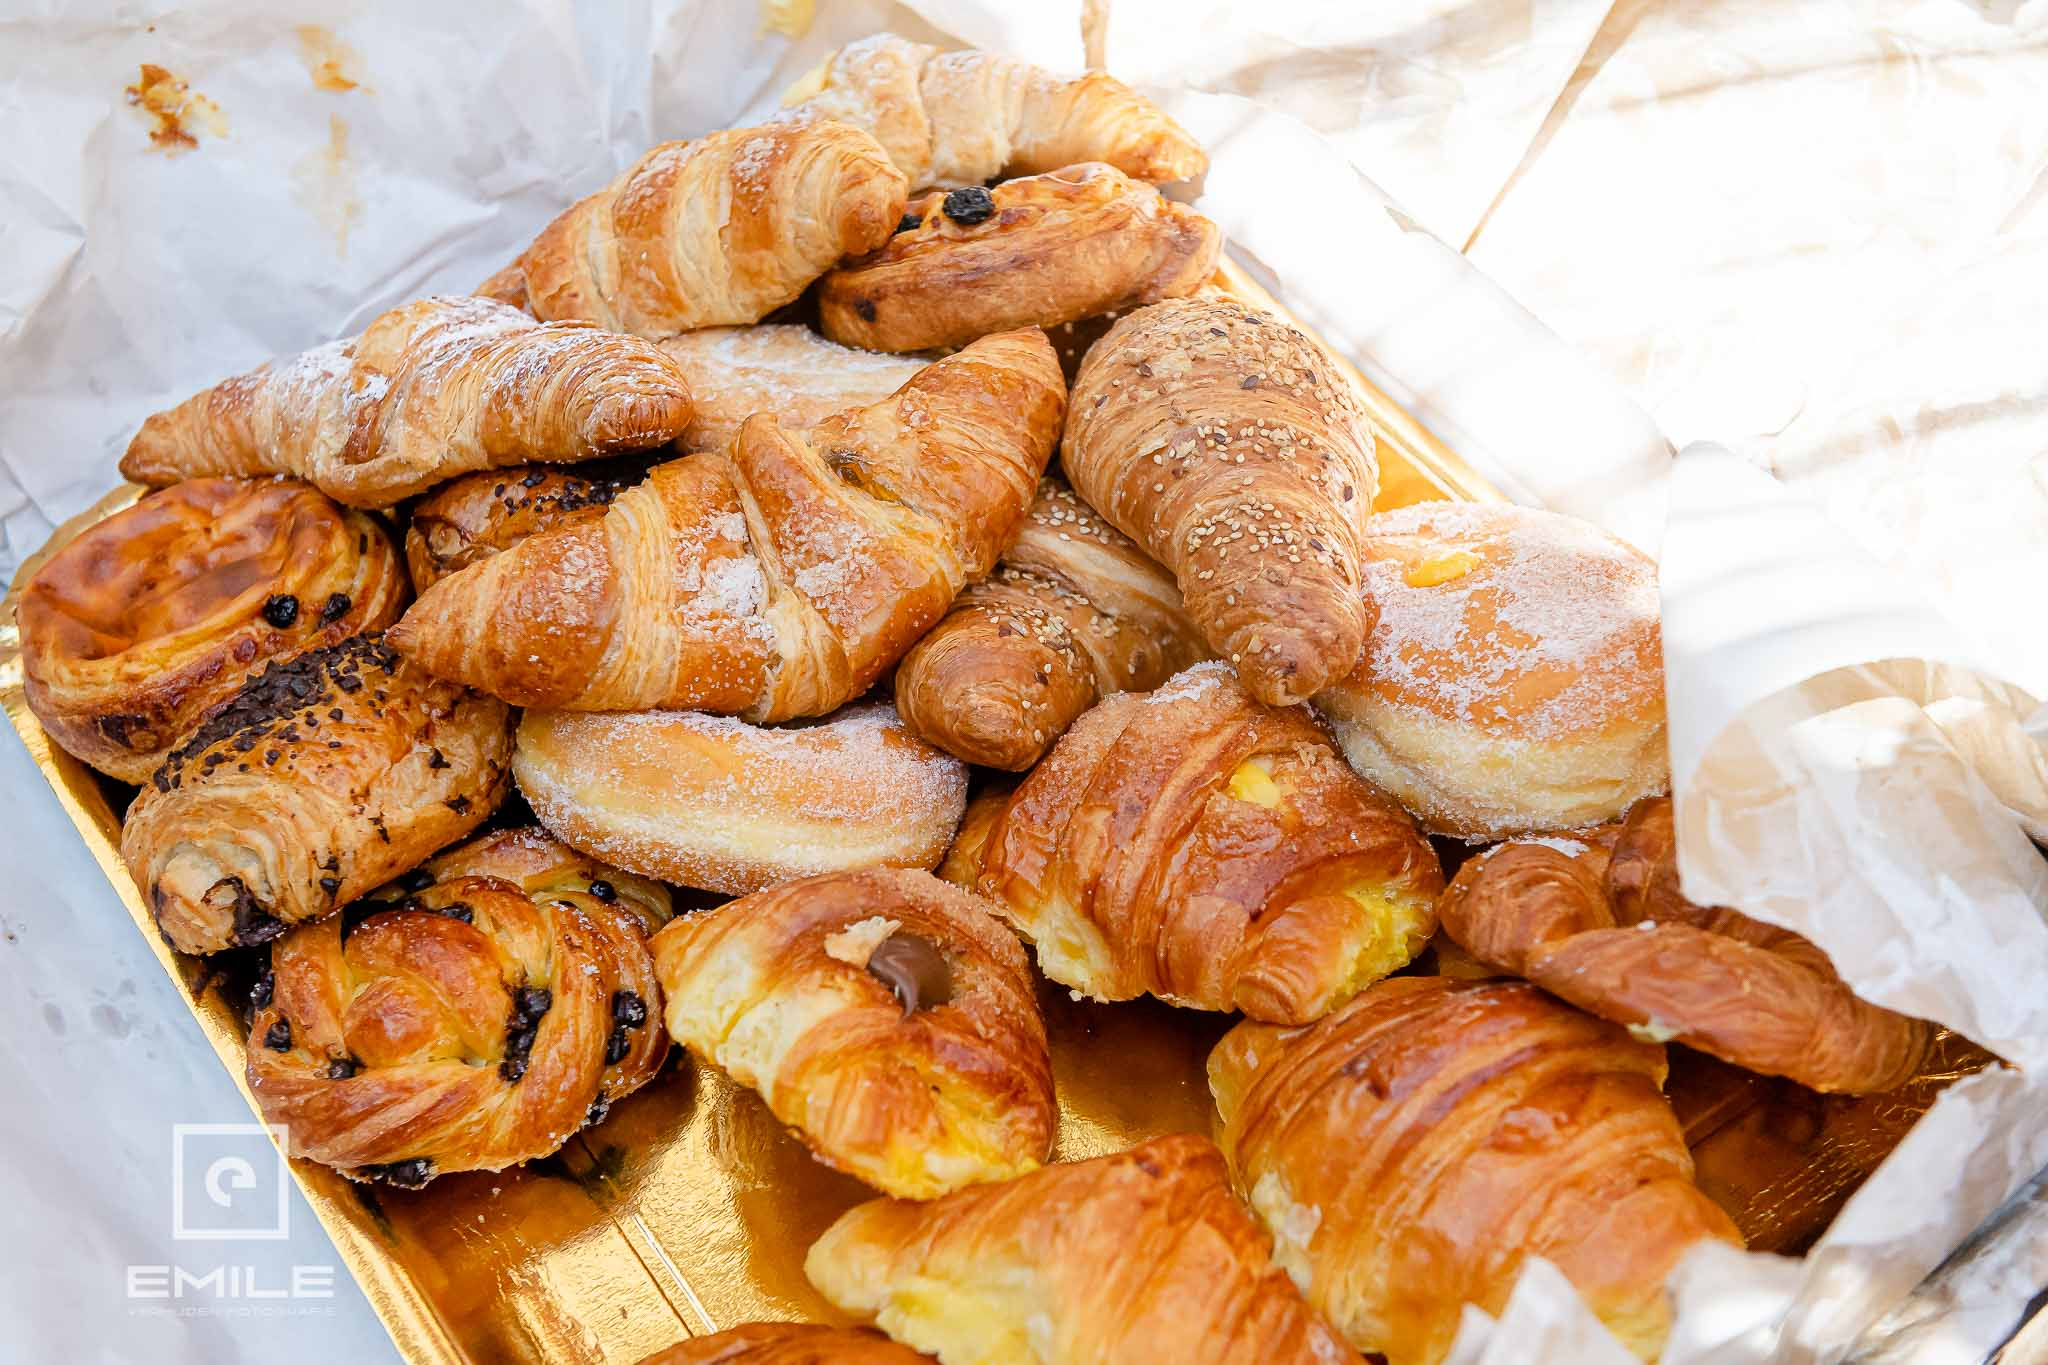 Echte Italiaanse pasta als ontbijt - Destination wedding San Gimignano - Toscane Italie - Iris en Job